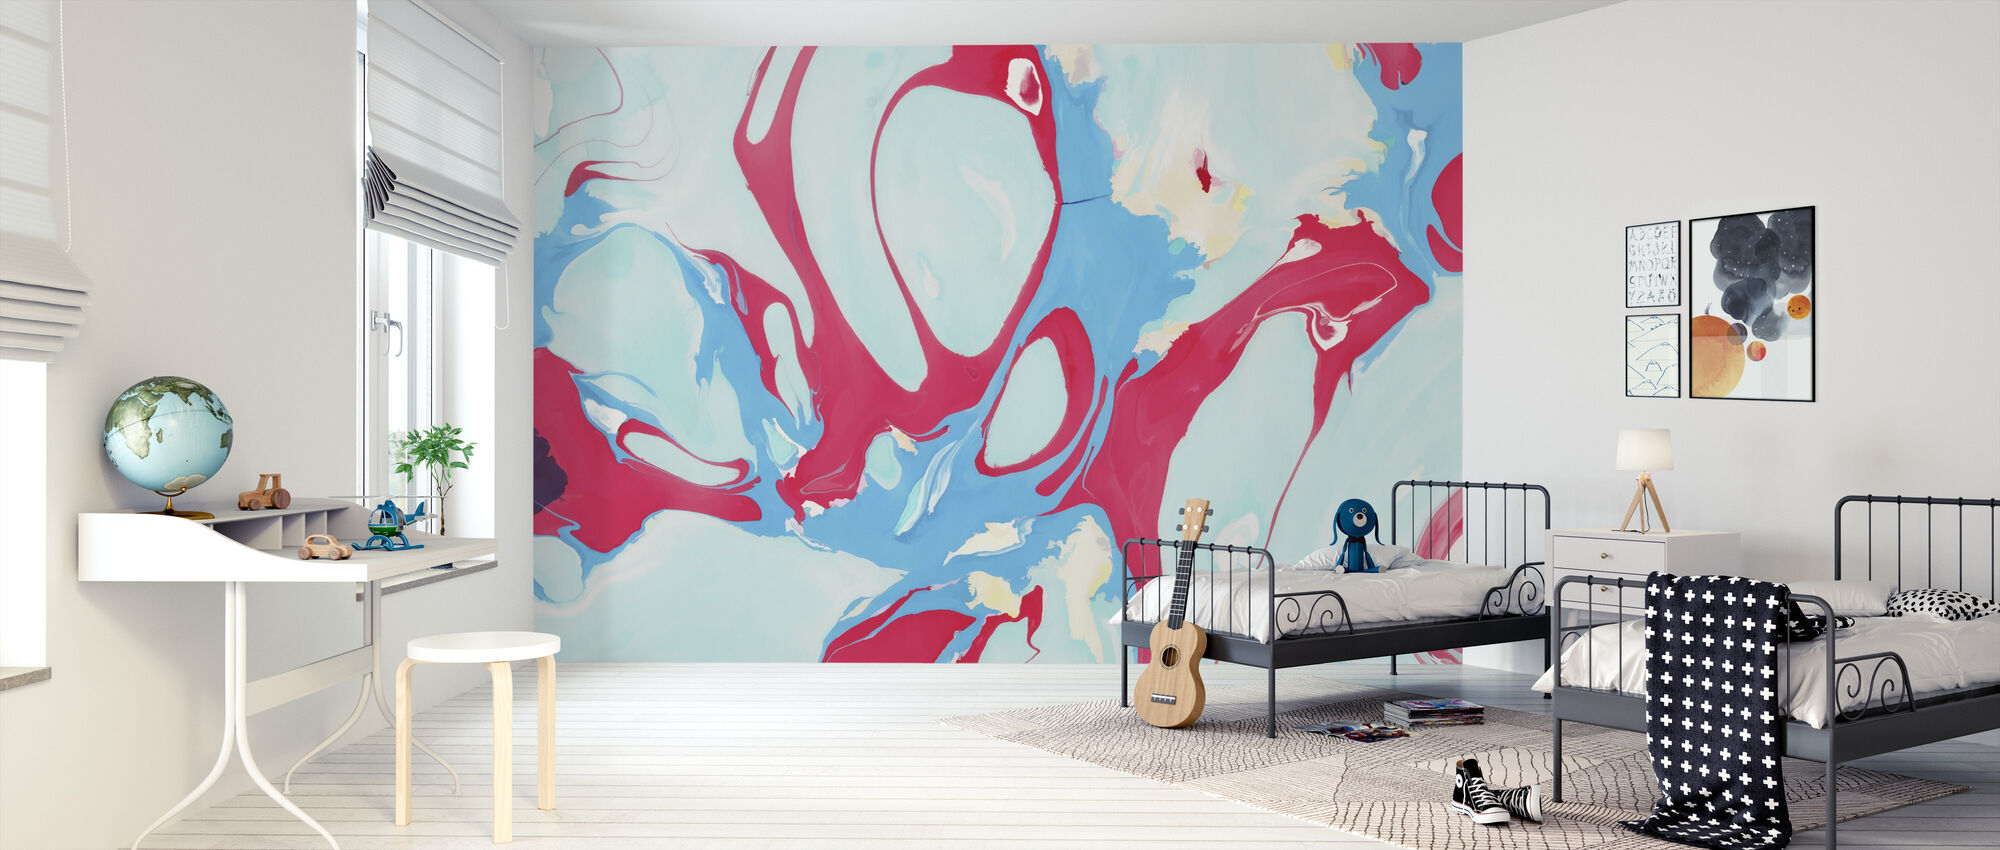 Abstract Marble Paint IIII - Wallpaper - Kids Room